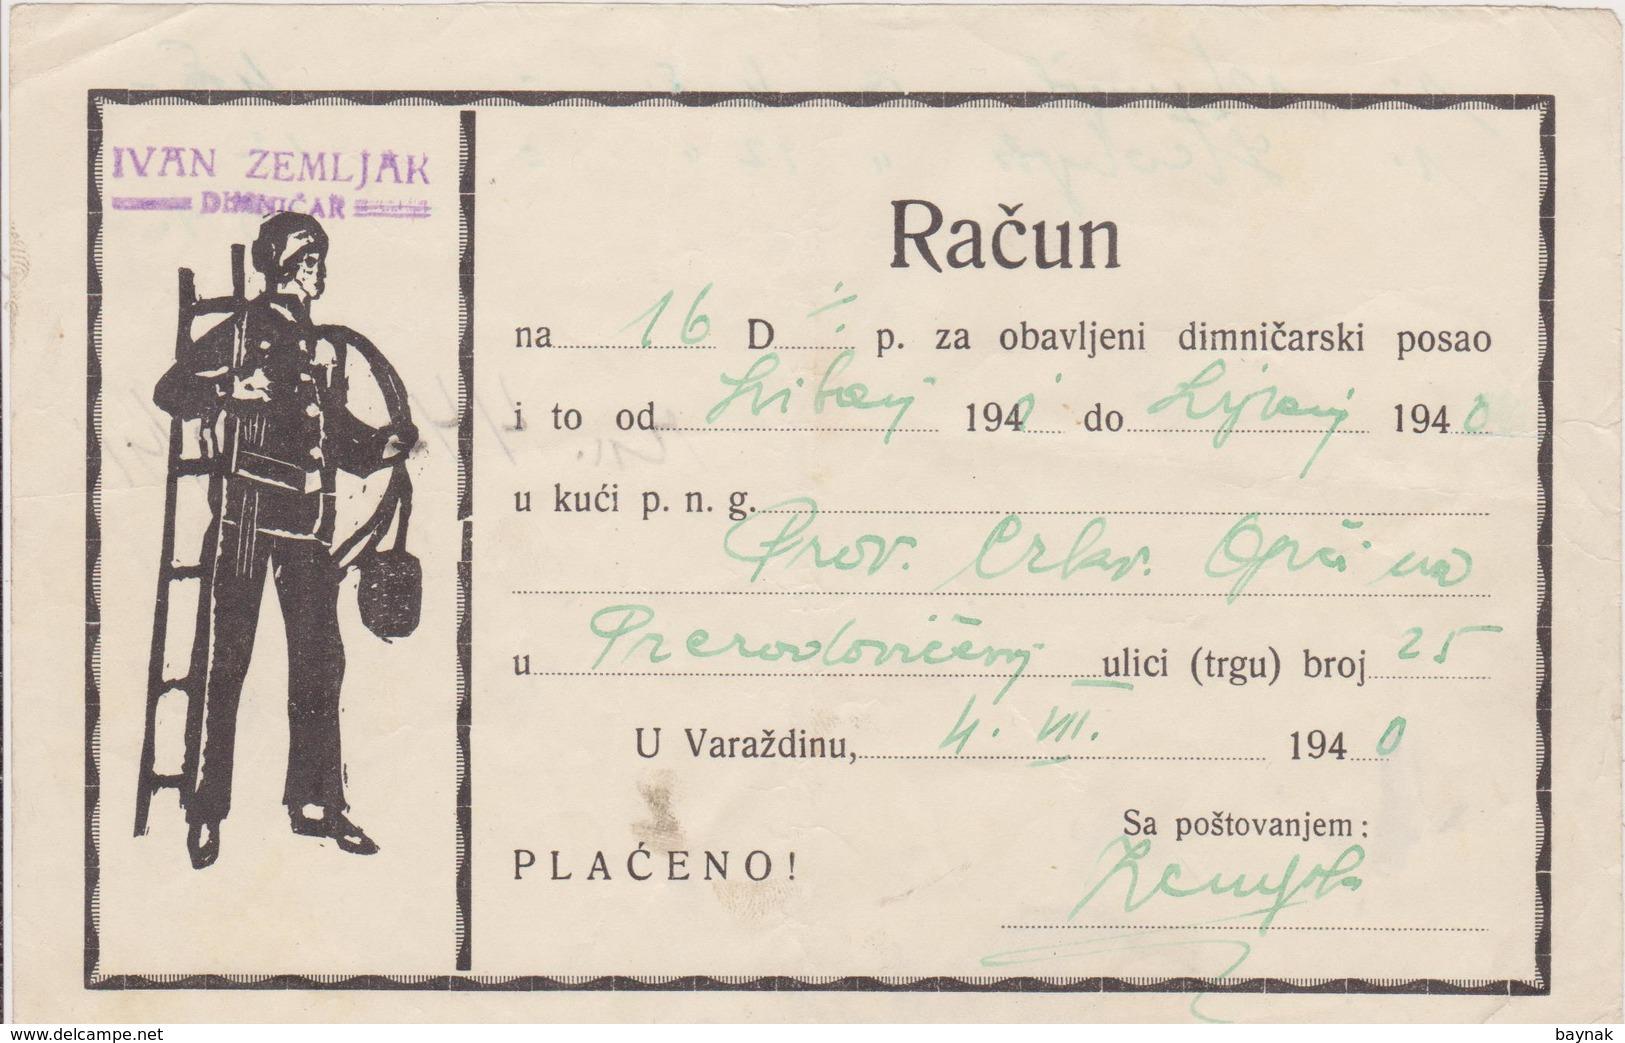 CROATIA  --  VARAZDIN  --  FACTURE, INVOICE  ~  1940 -  IVAN ZEMLJAK,  DIMNJACAR, MONEUR, CHIMNEY SWEEP - Fatture & Documenti Commerciali